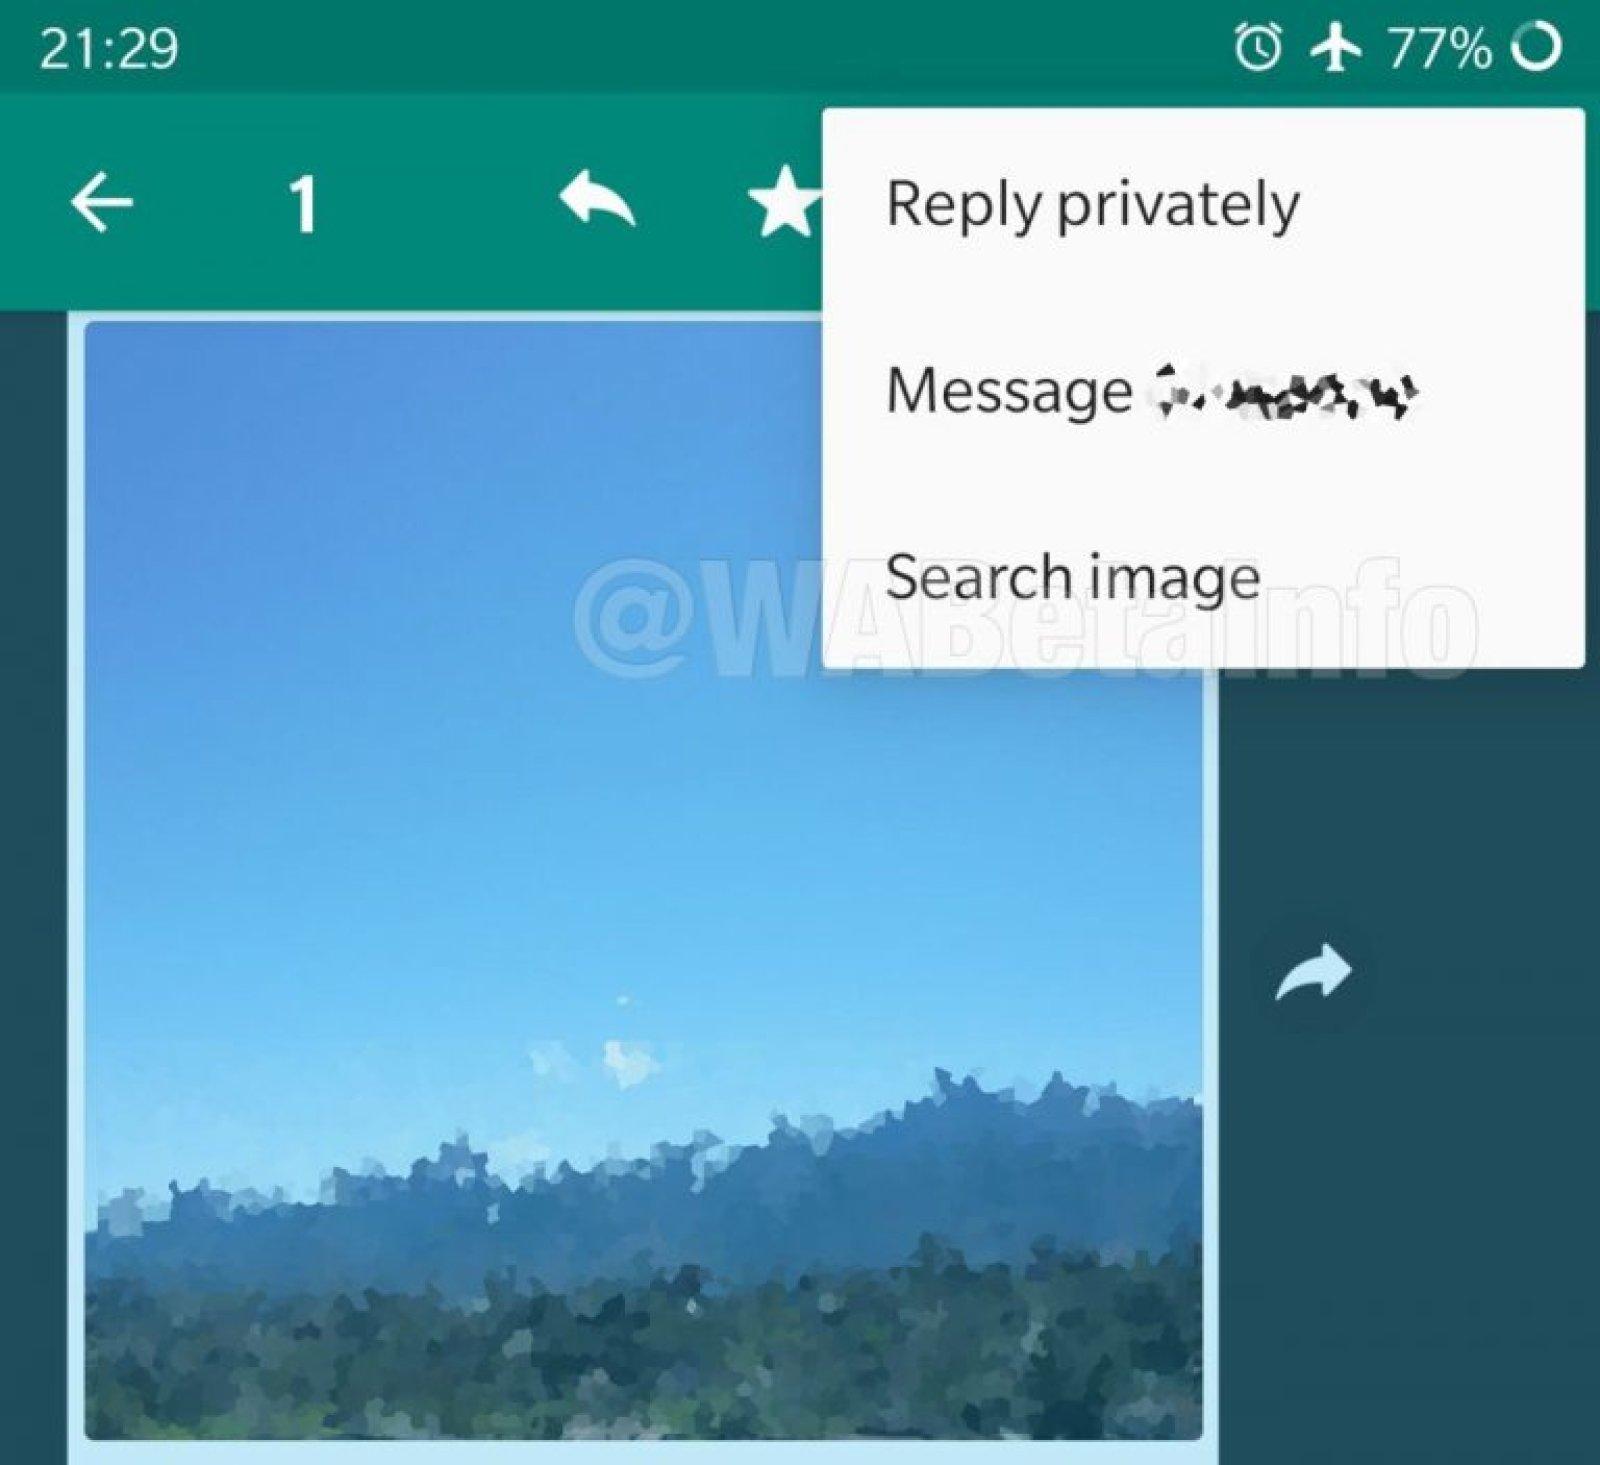 Whatsapp Fake News Imágenes Búsqueda